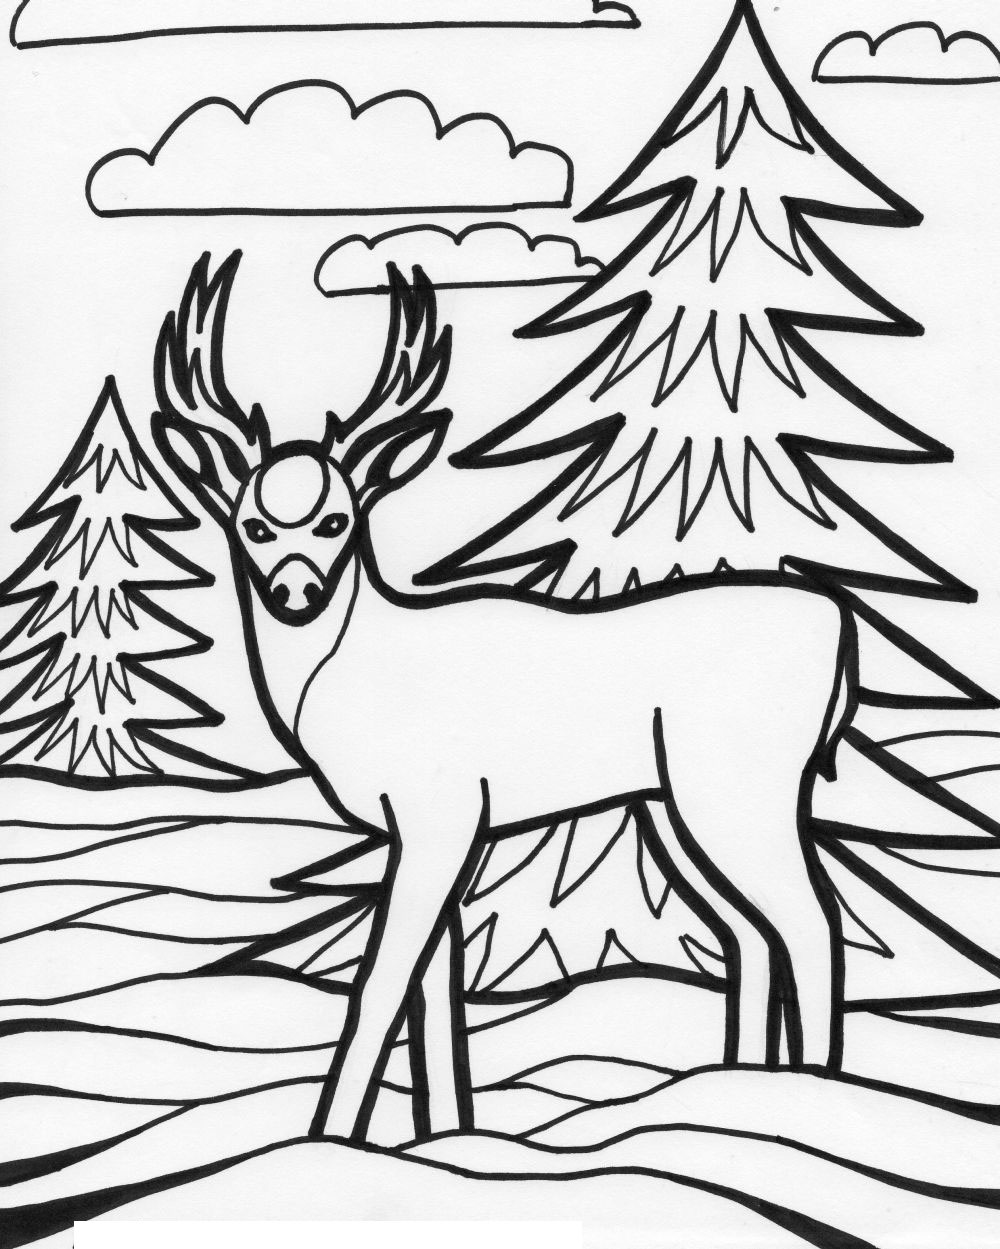 colouring sheets animals 30 free printable geometric animal coloring pages the animals colouring sheets